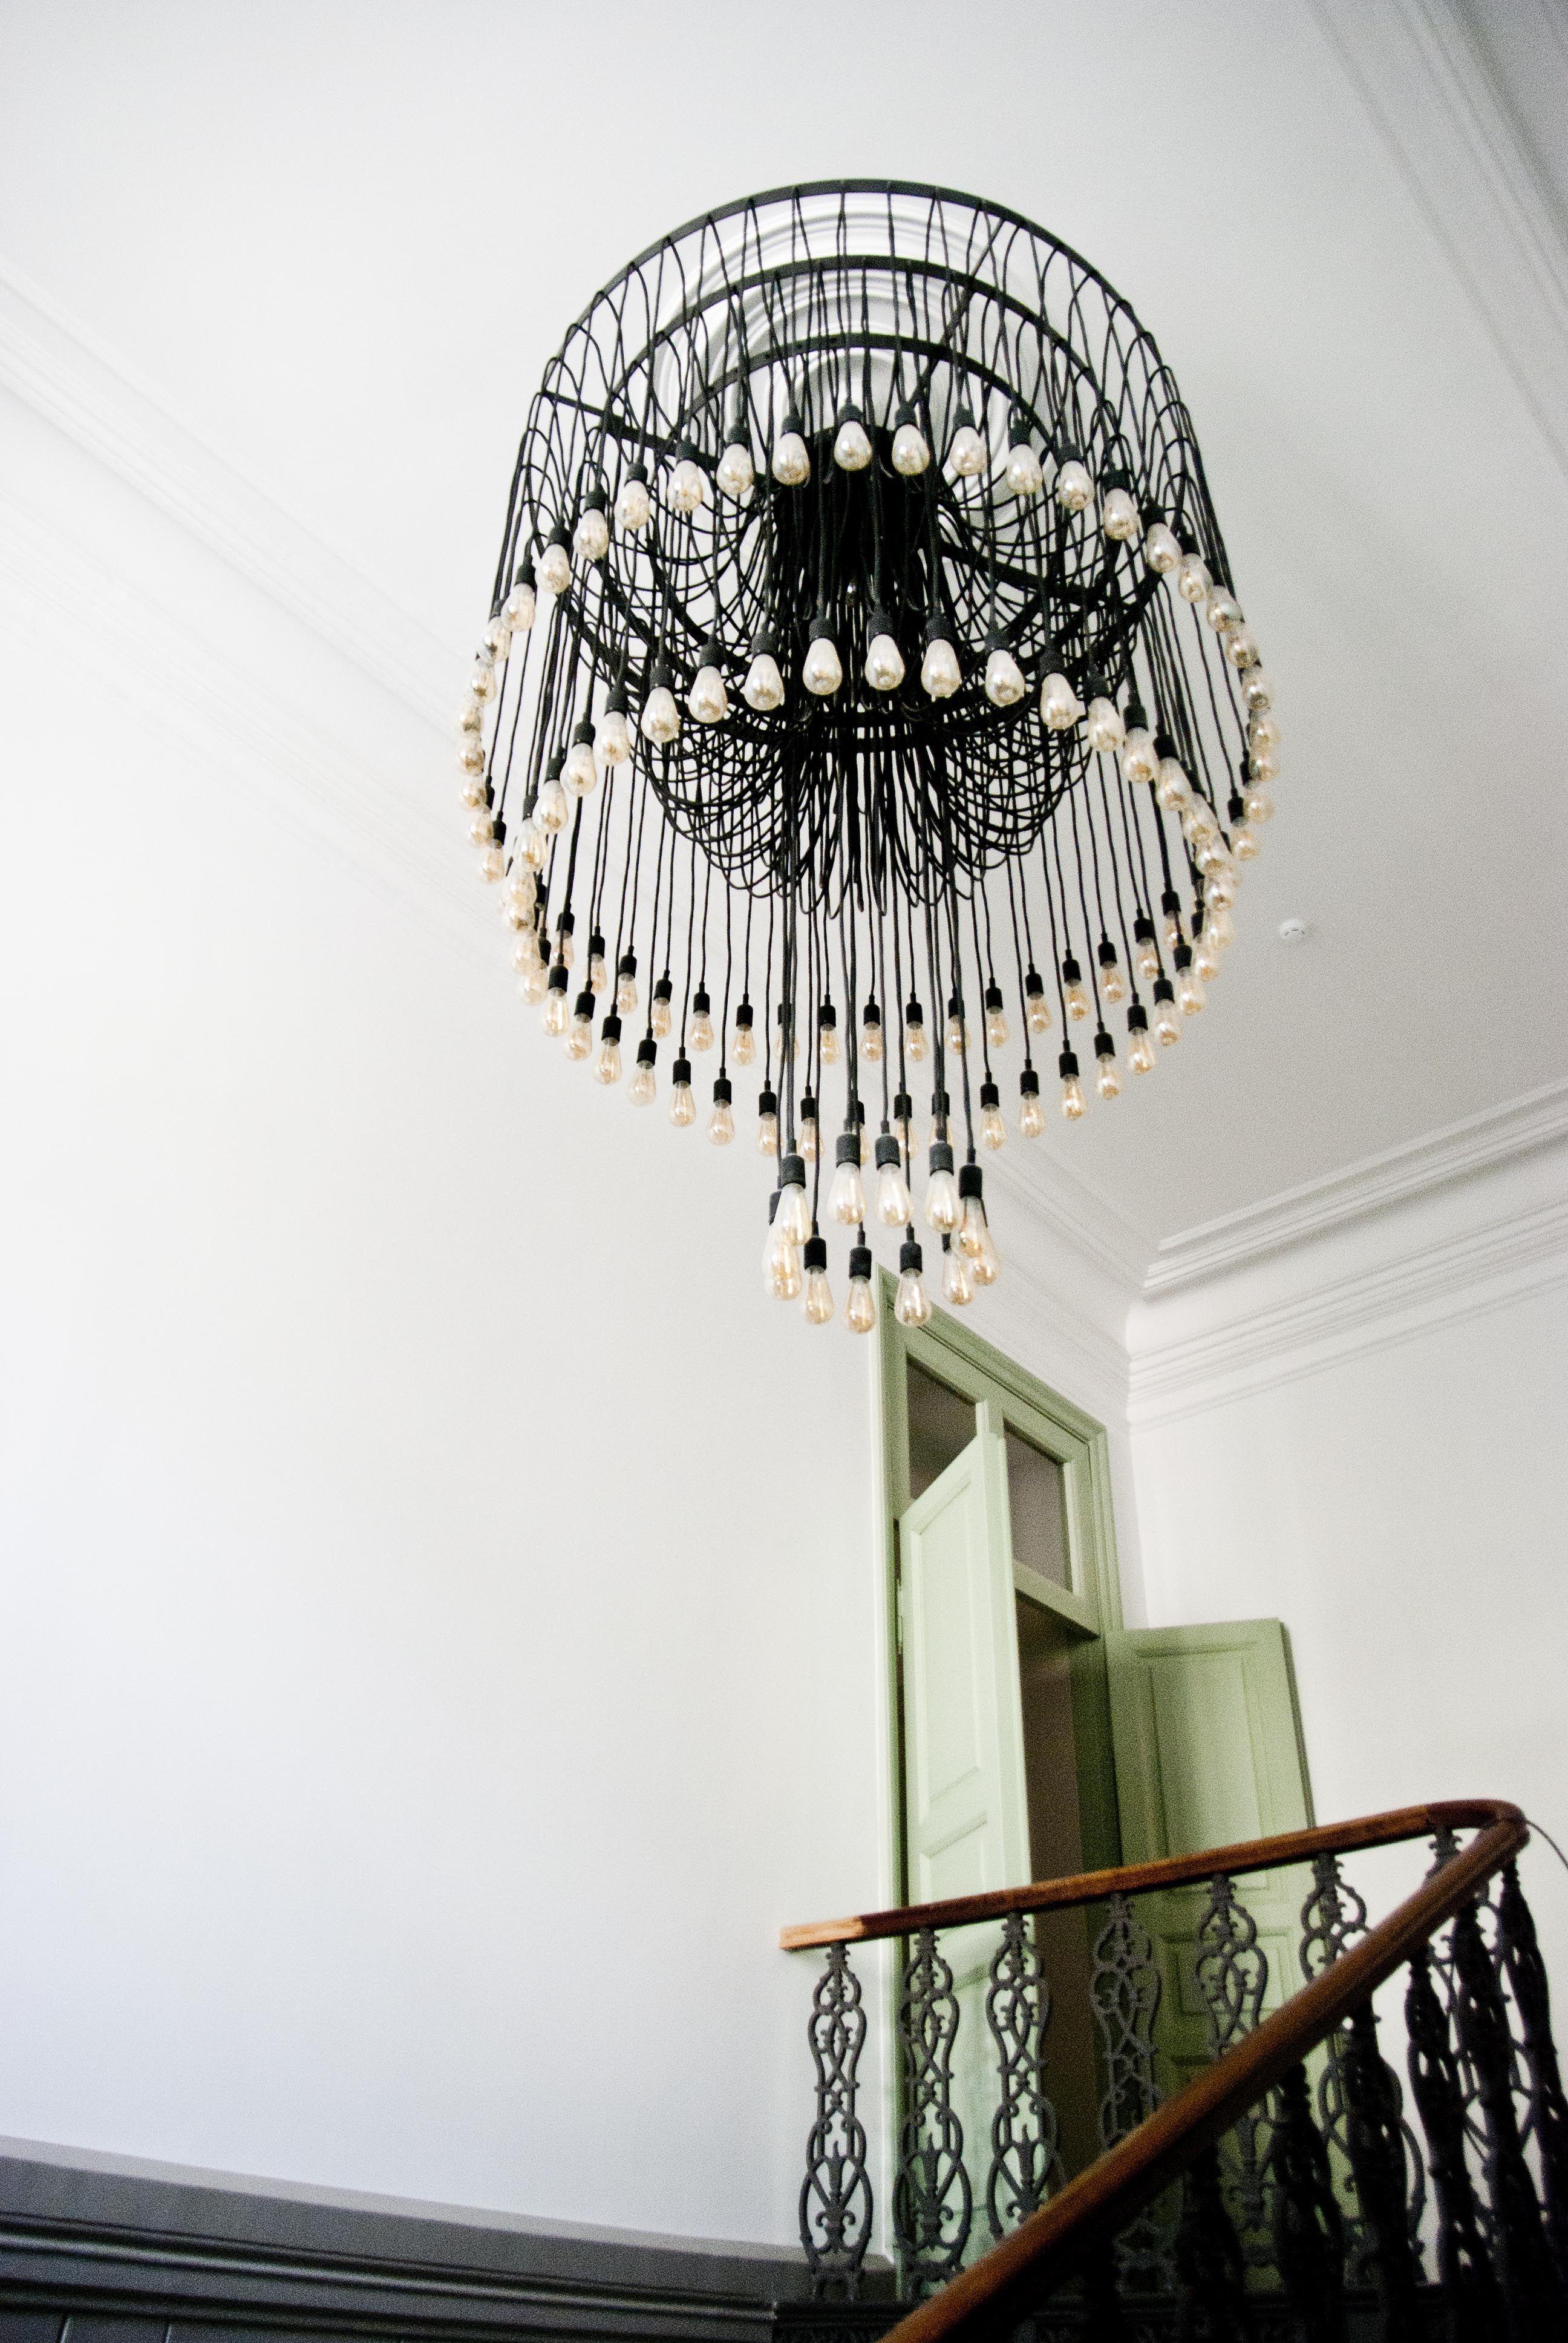 Industrial lighting in stairway. Design of light. Architecture ...